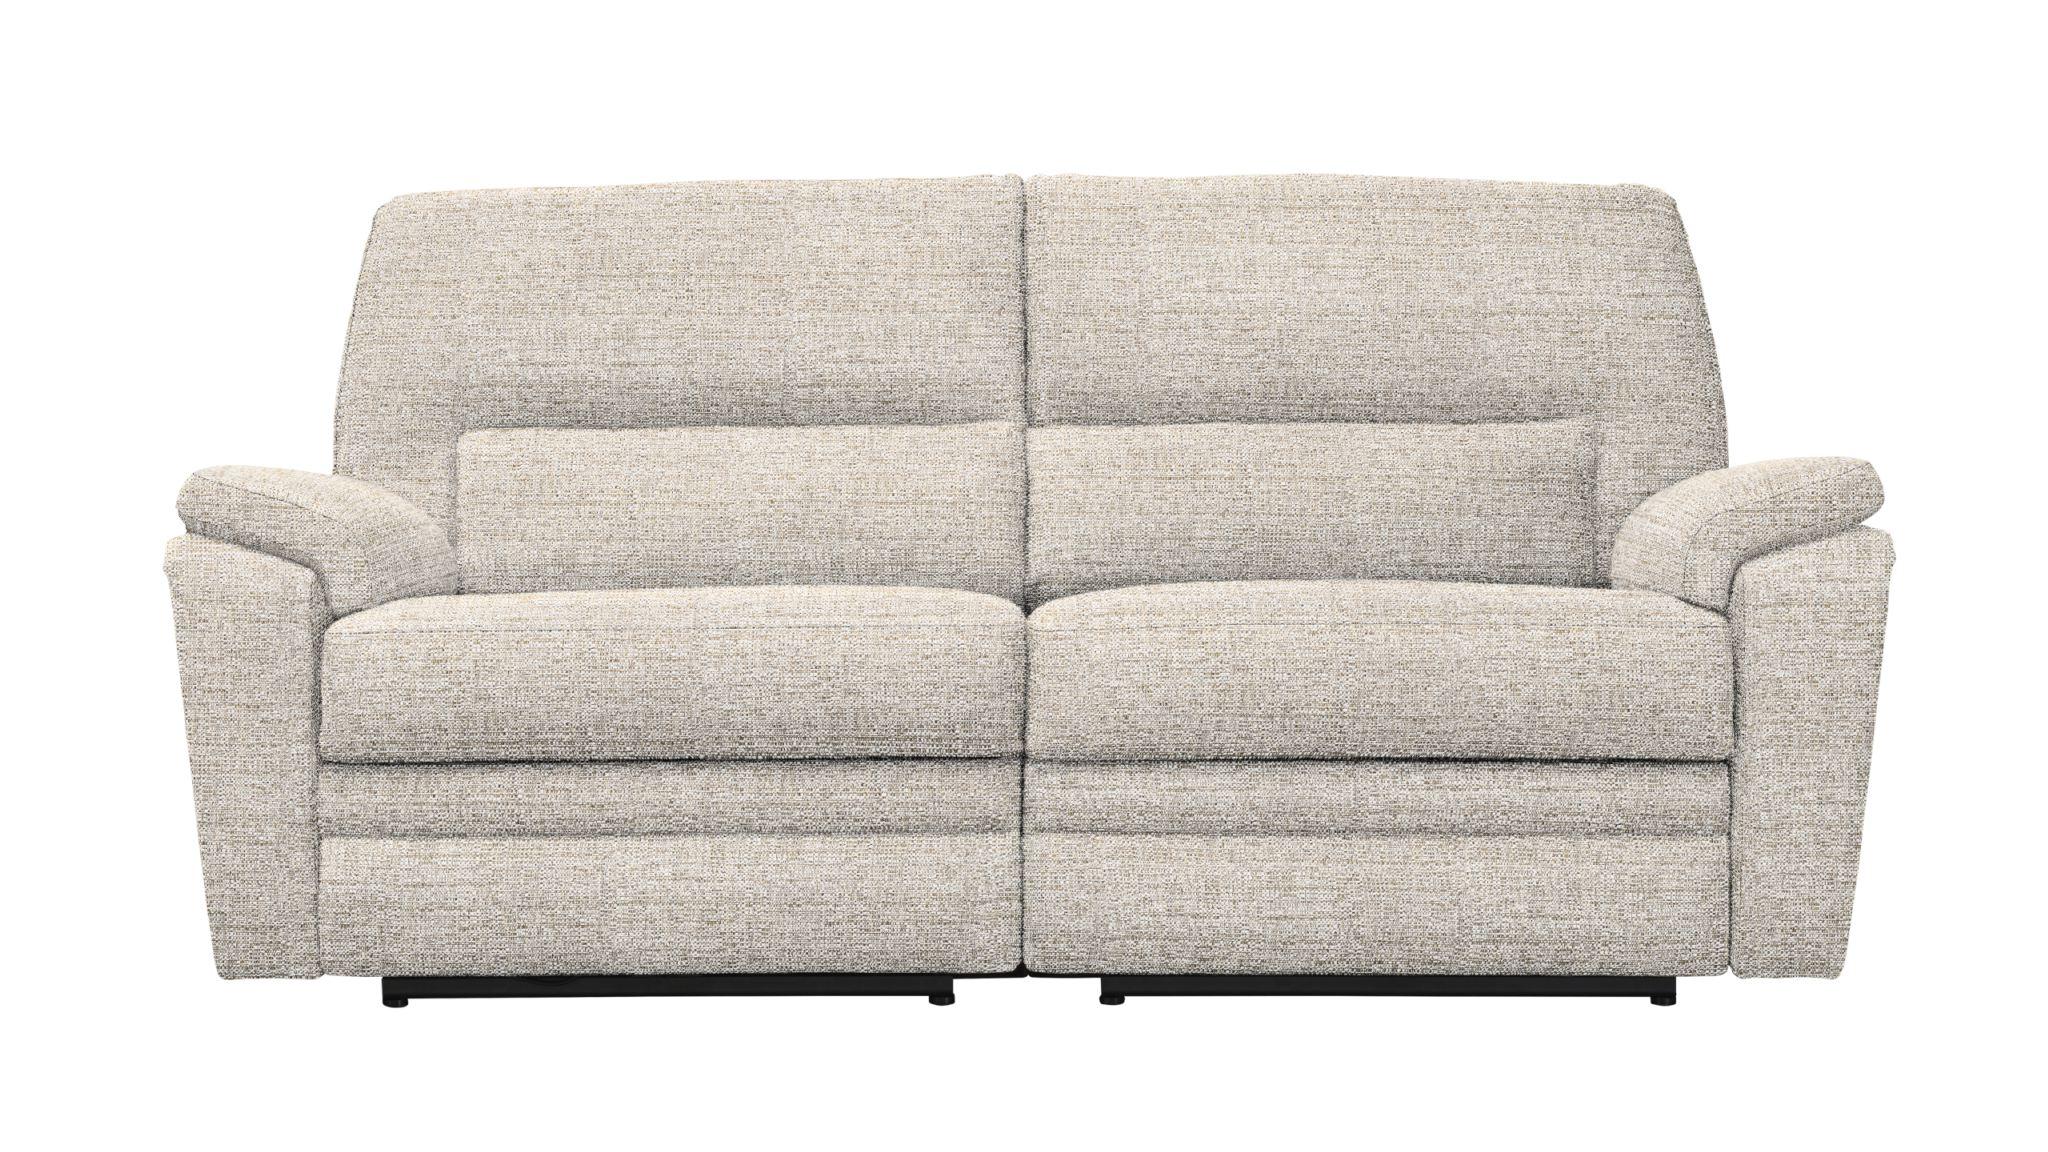 Parker Knoll Hampton Large 2 Seater Reclining Sofa